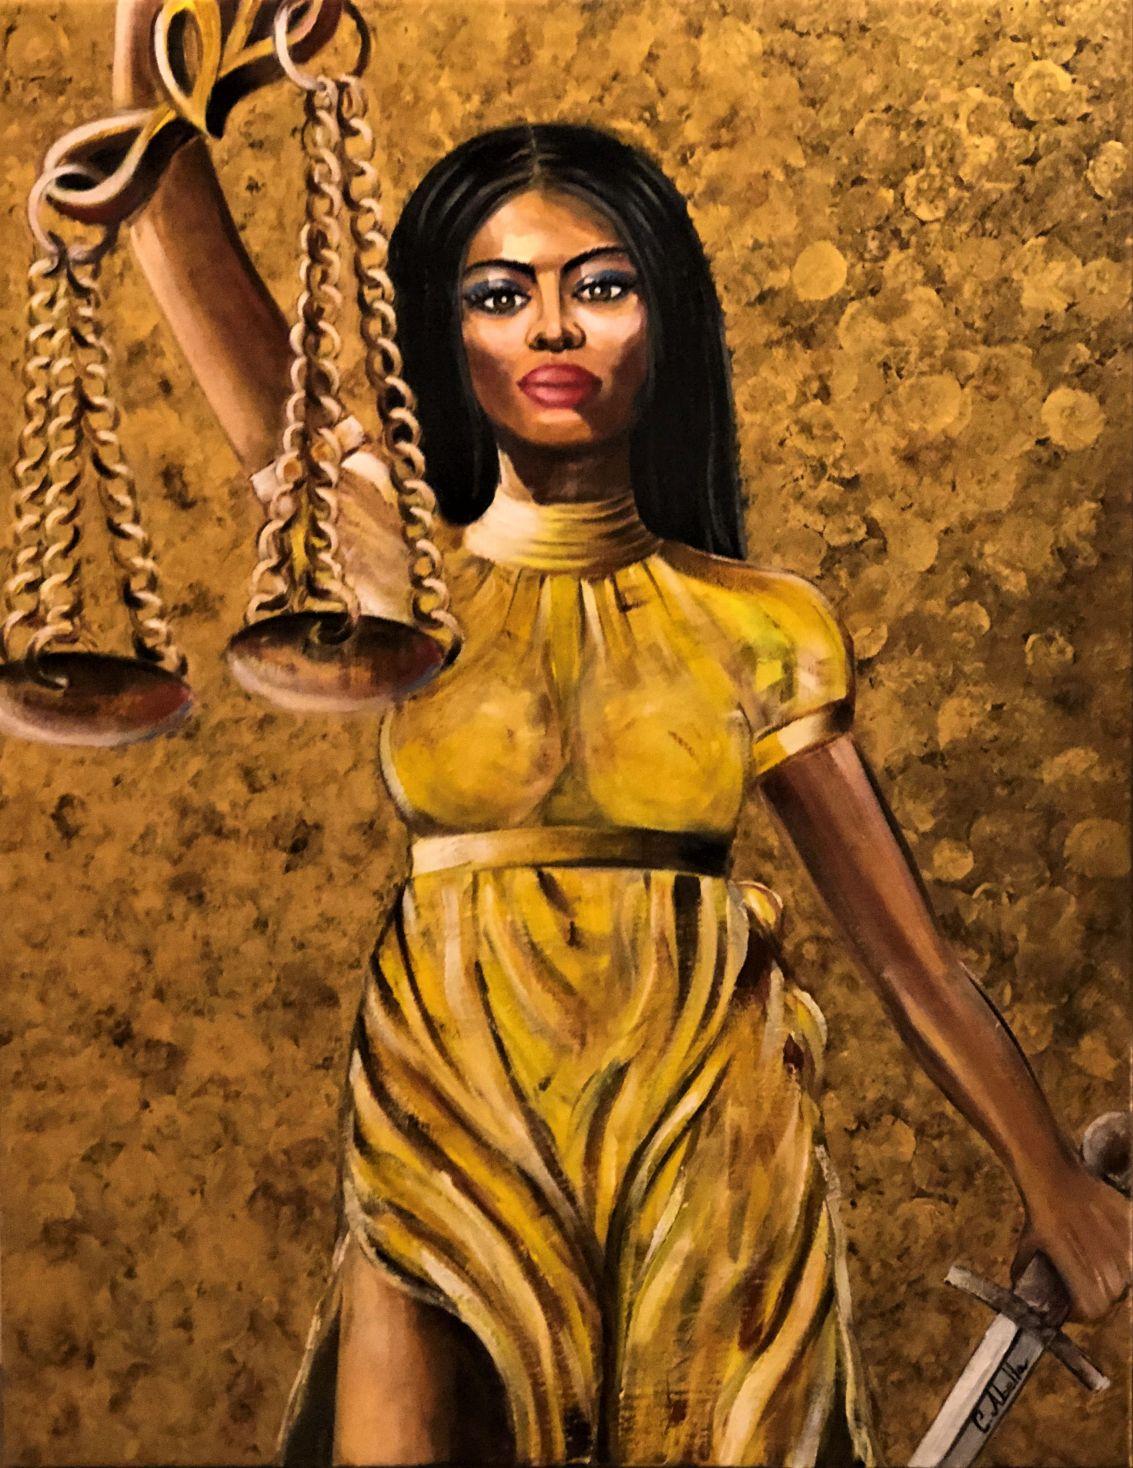 JUSTICE II